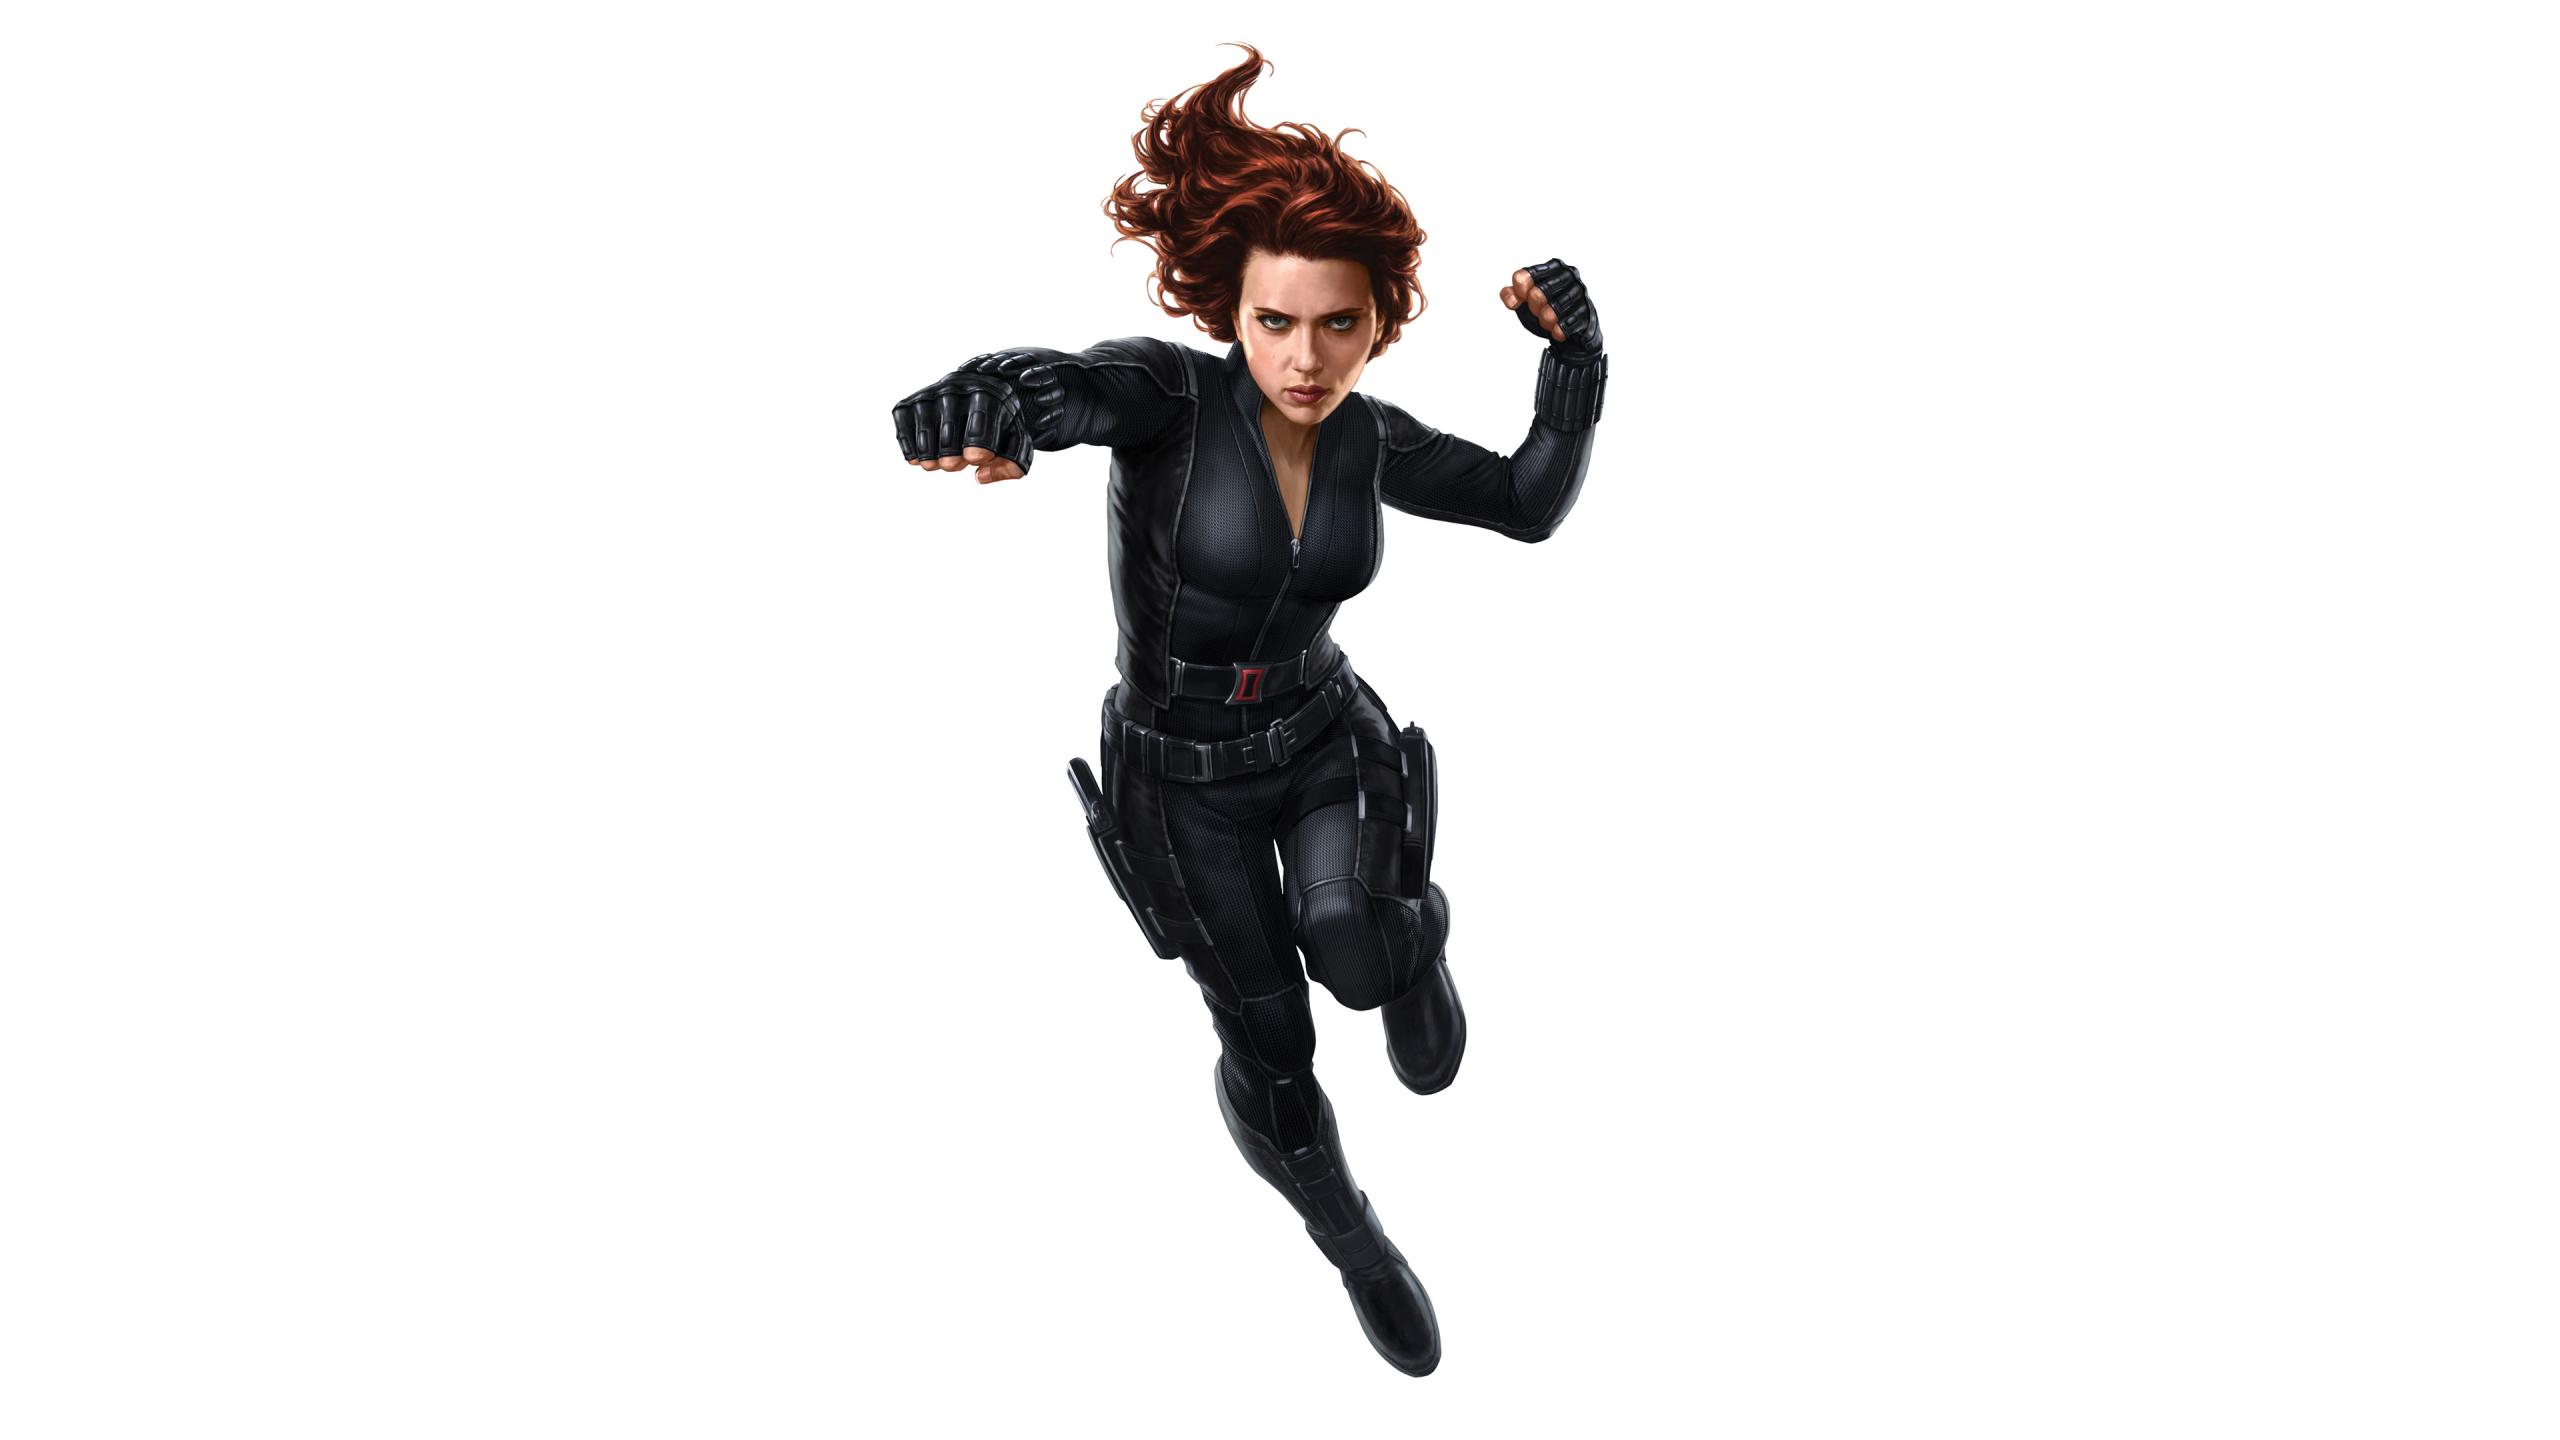 Desktop Wallpaper Black Widow Avengers Infinity War 2018 Movie Minimal Artwork 4k Hd Image Picture Background 686320